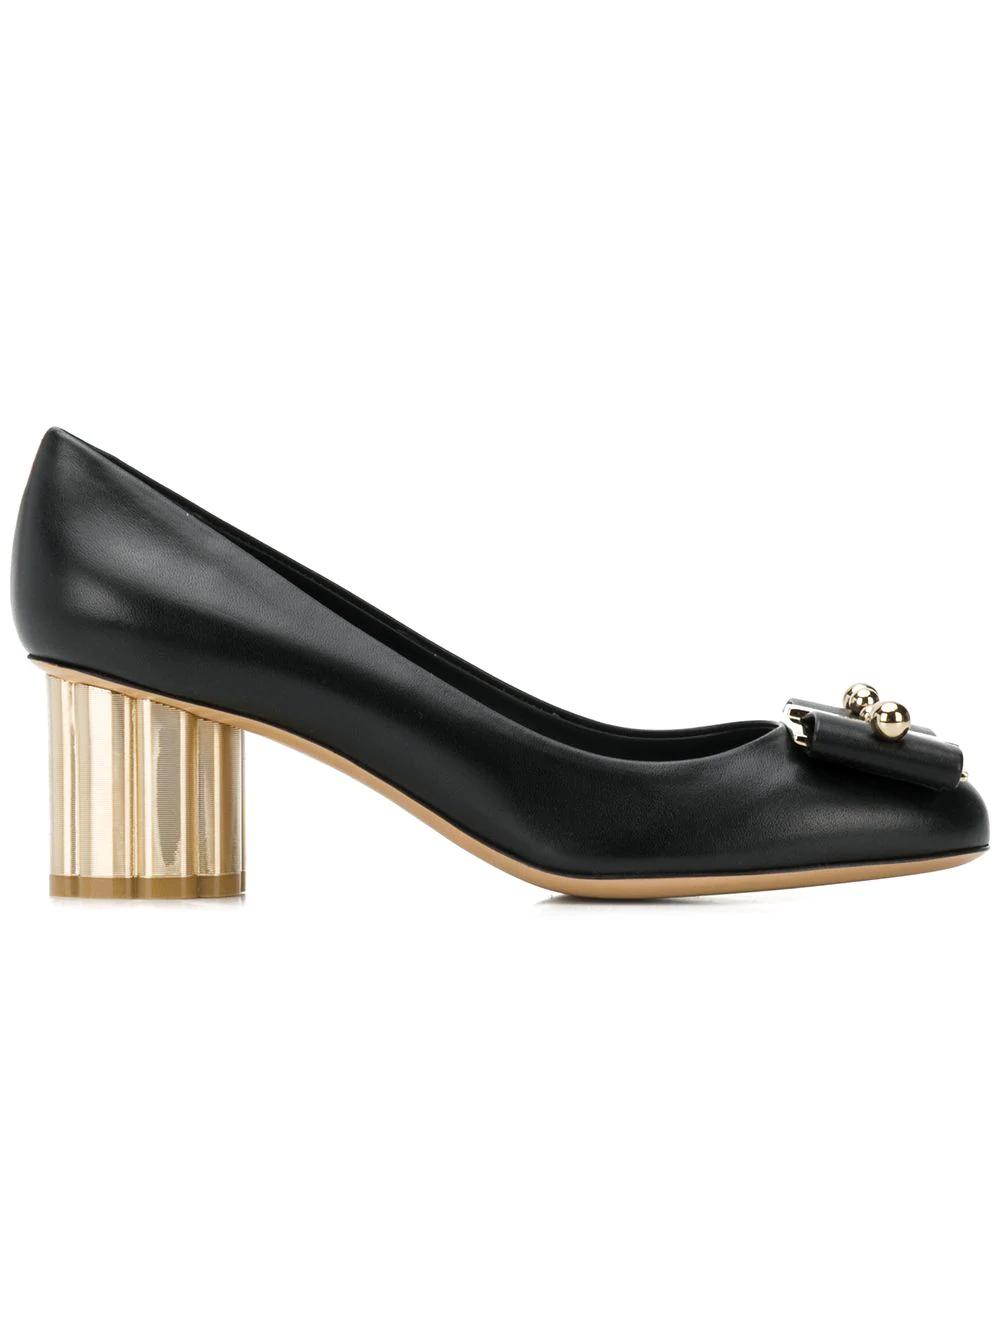 1ddecba28eaf Salvatore Ferragamo Flower Heel Pumps - Black